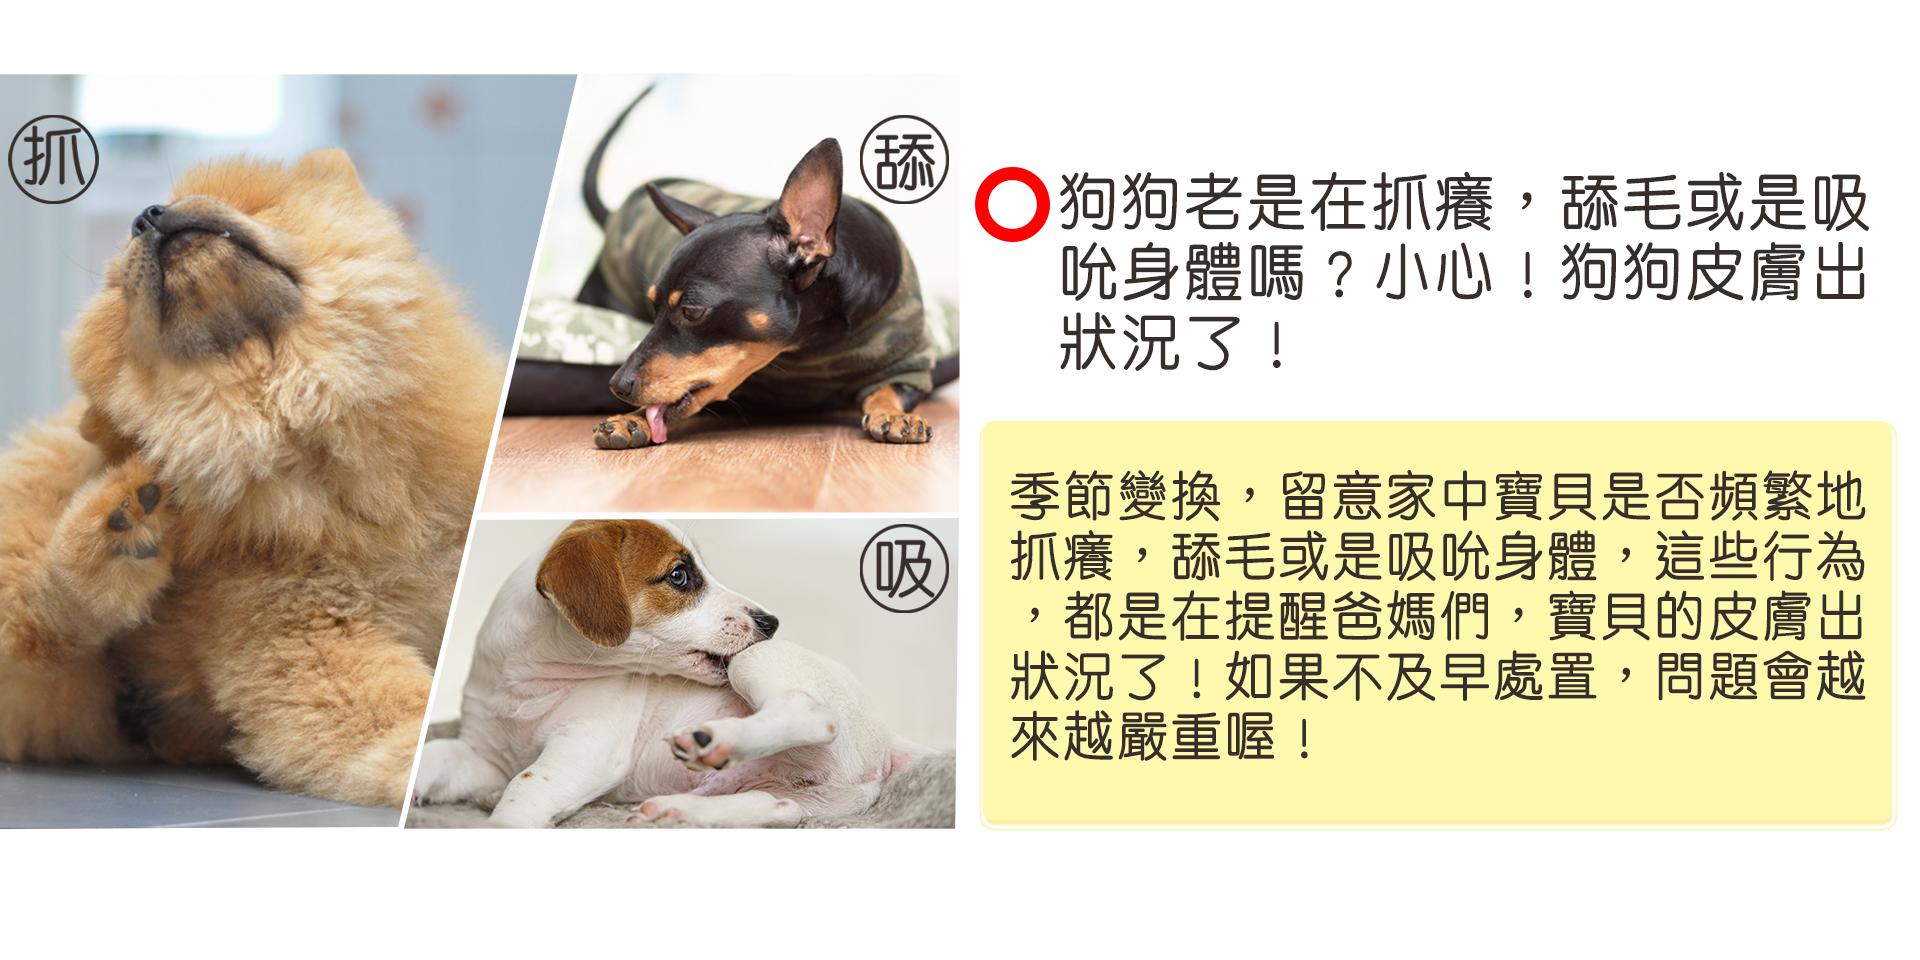 content-dog360-01